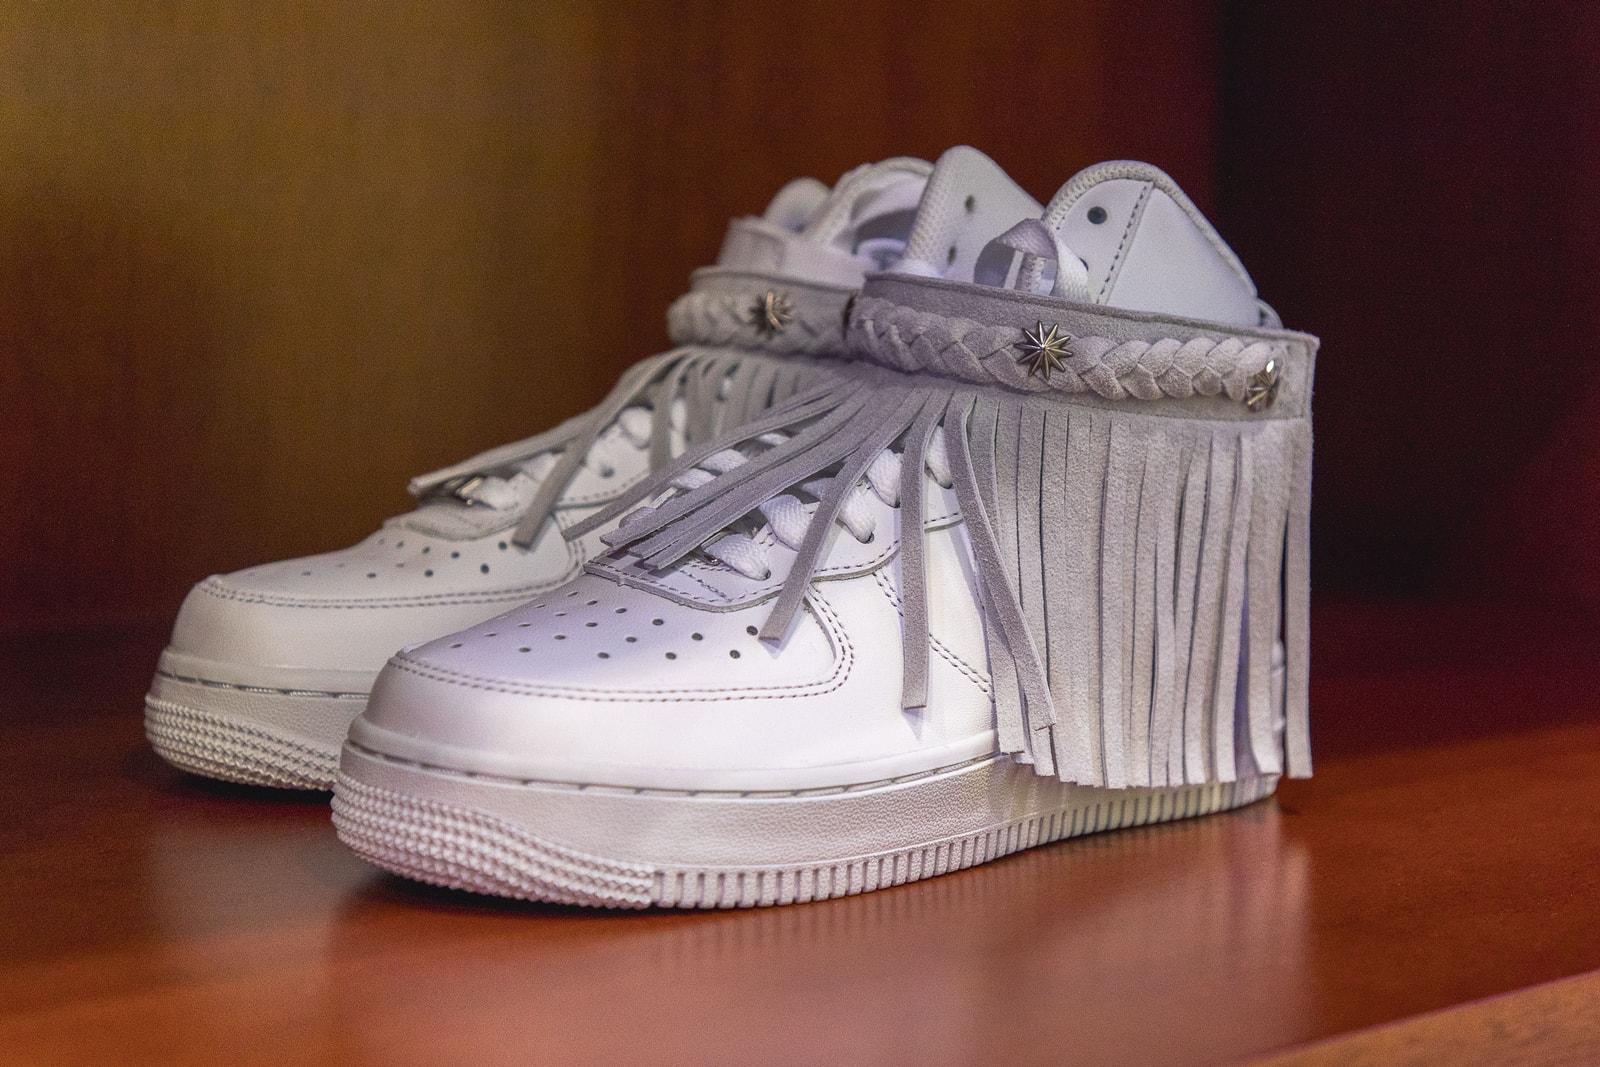 Chitose Abe Sacai Lane Crawford Pop-up Interview Brand Collaboration Nike BEARBRICK